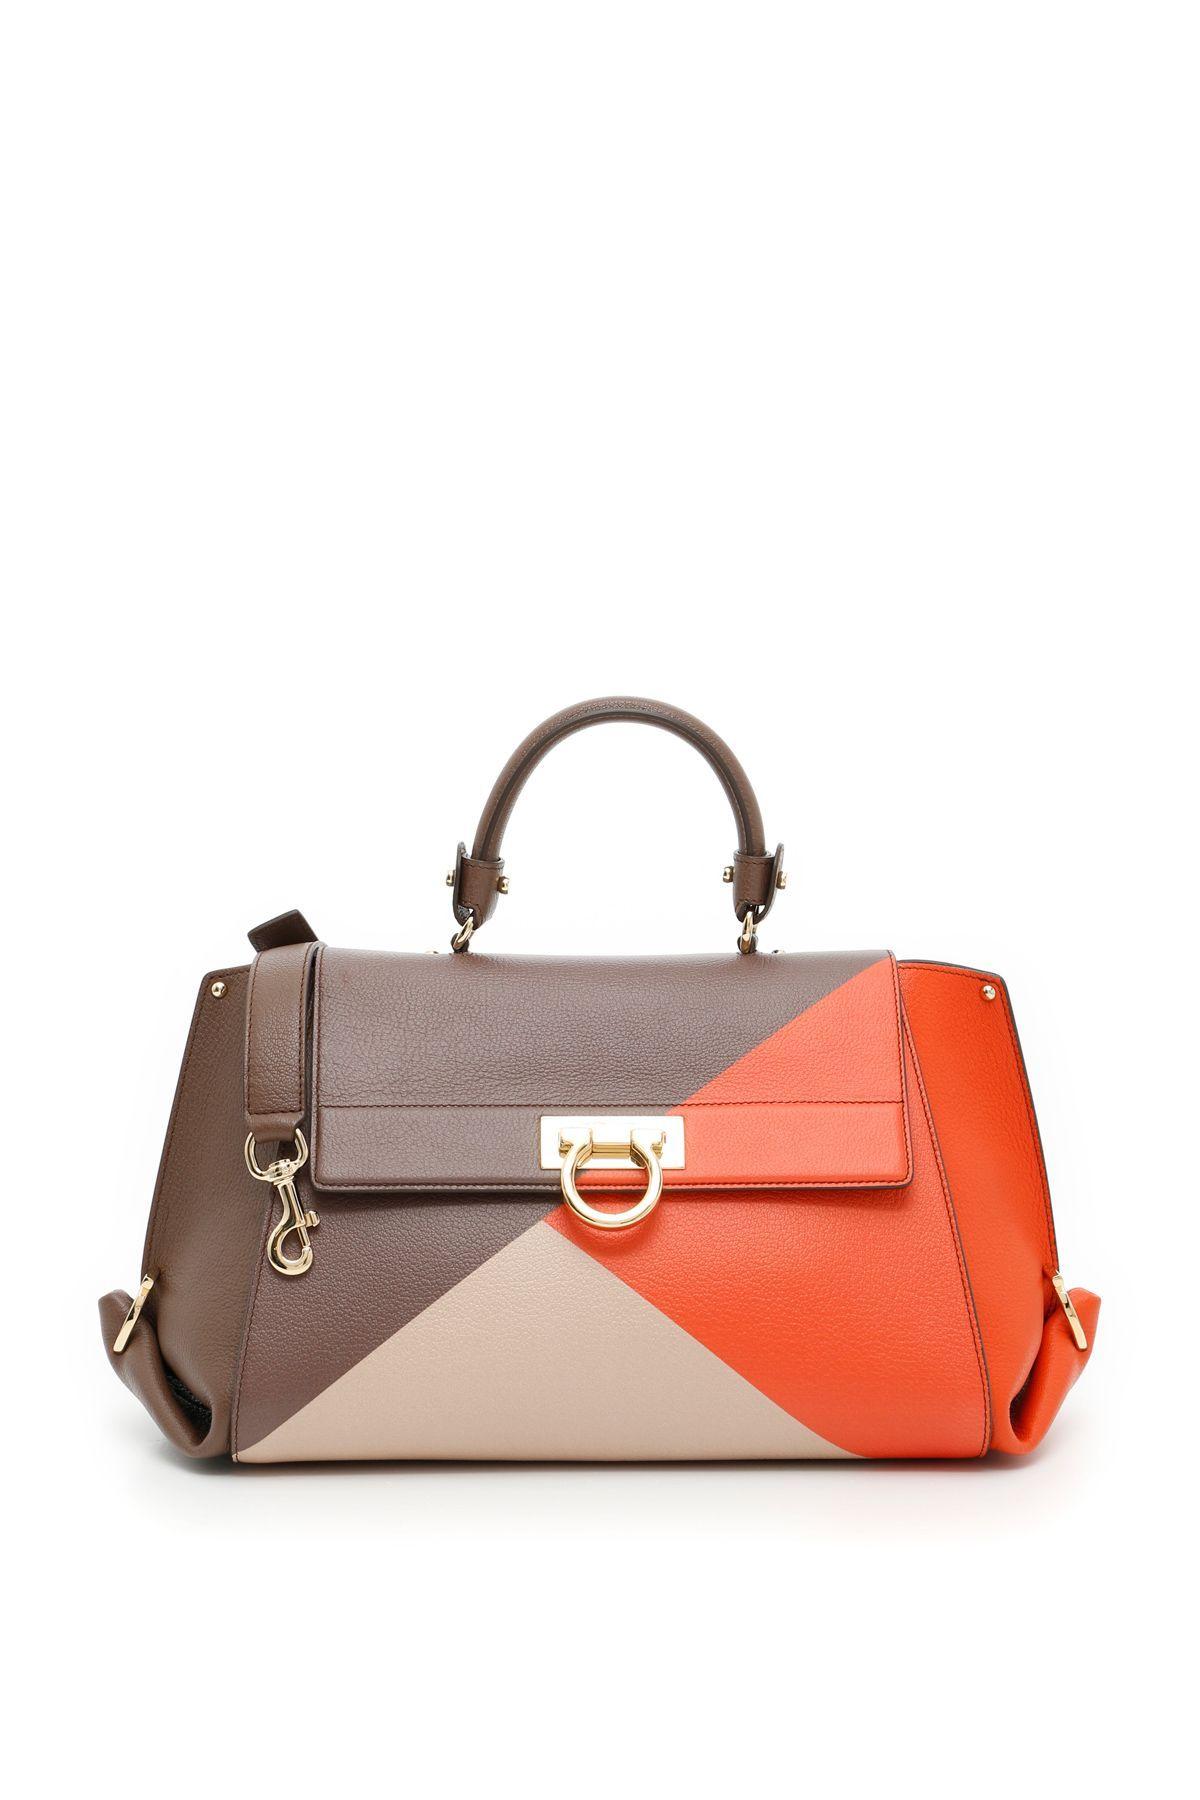 27f55bbec1 SALVATORE FERRAGAMO MULTICOLOR SOFIA BAG.  salvatoreferragamo  bags  shoulder  bags  leather  lining